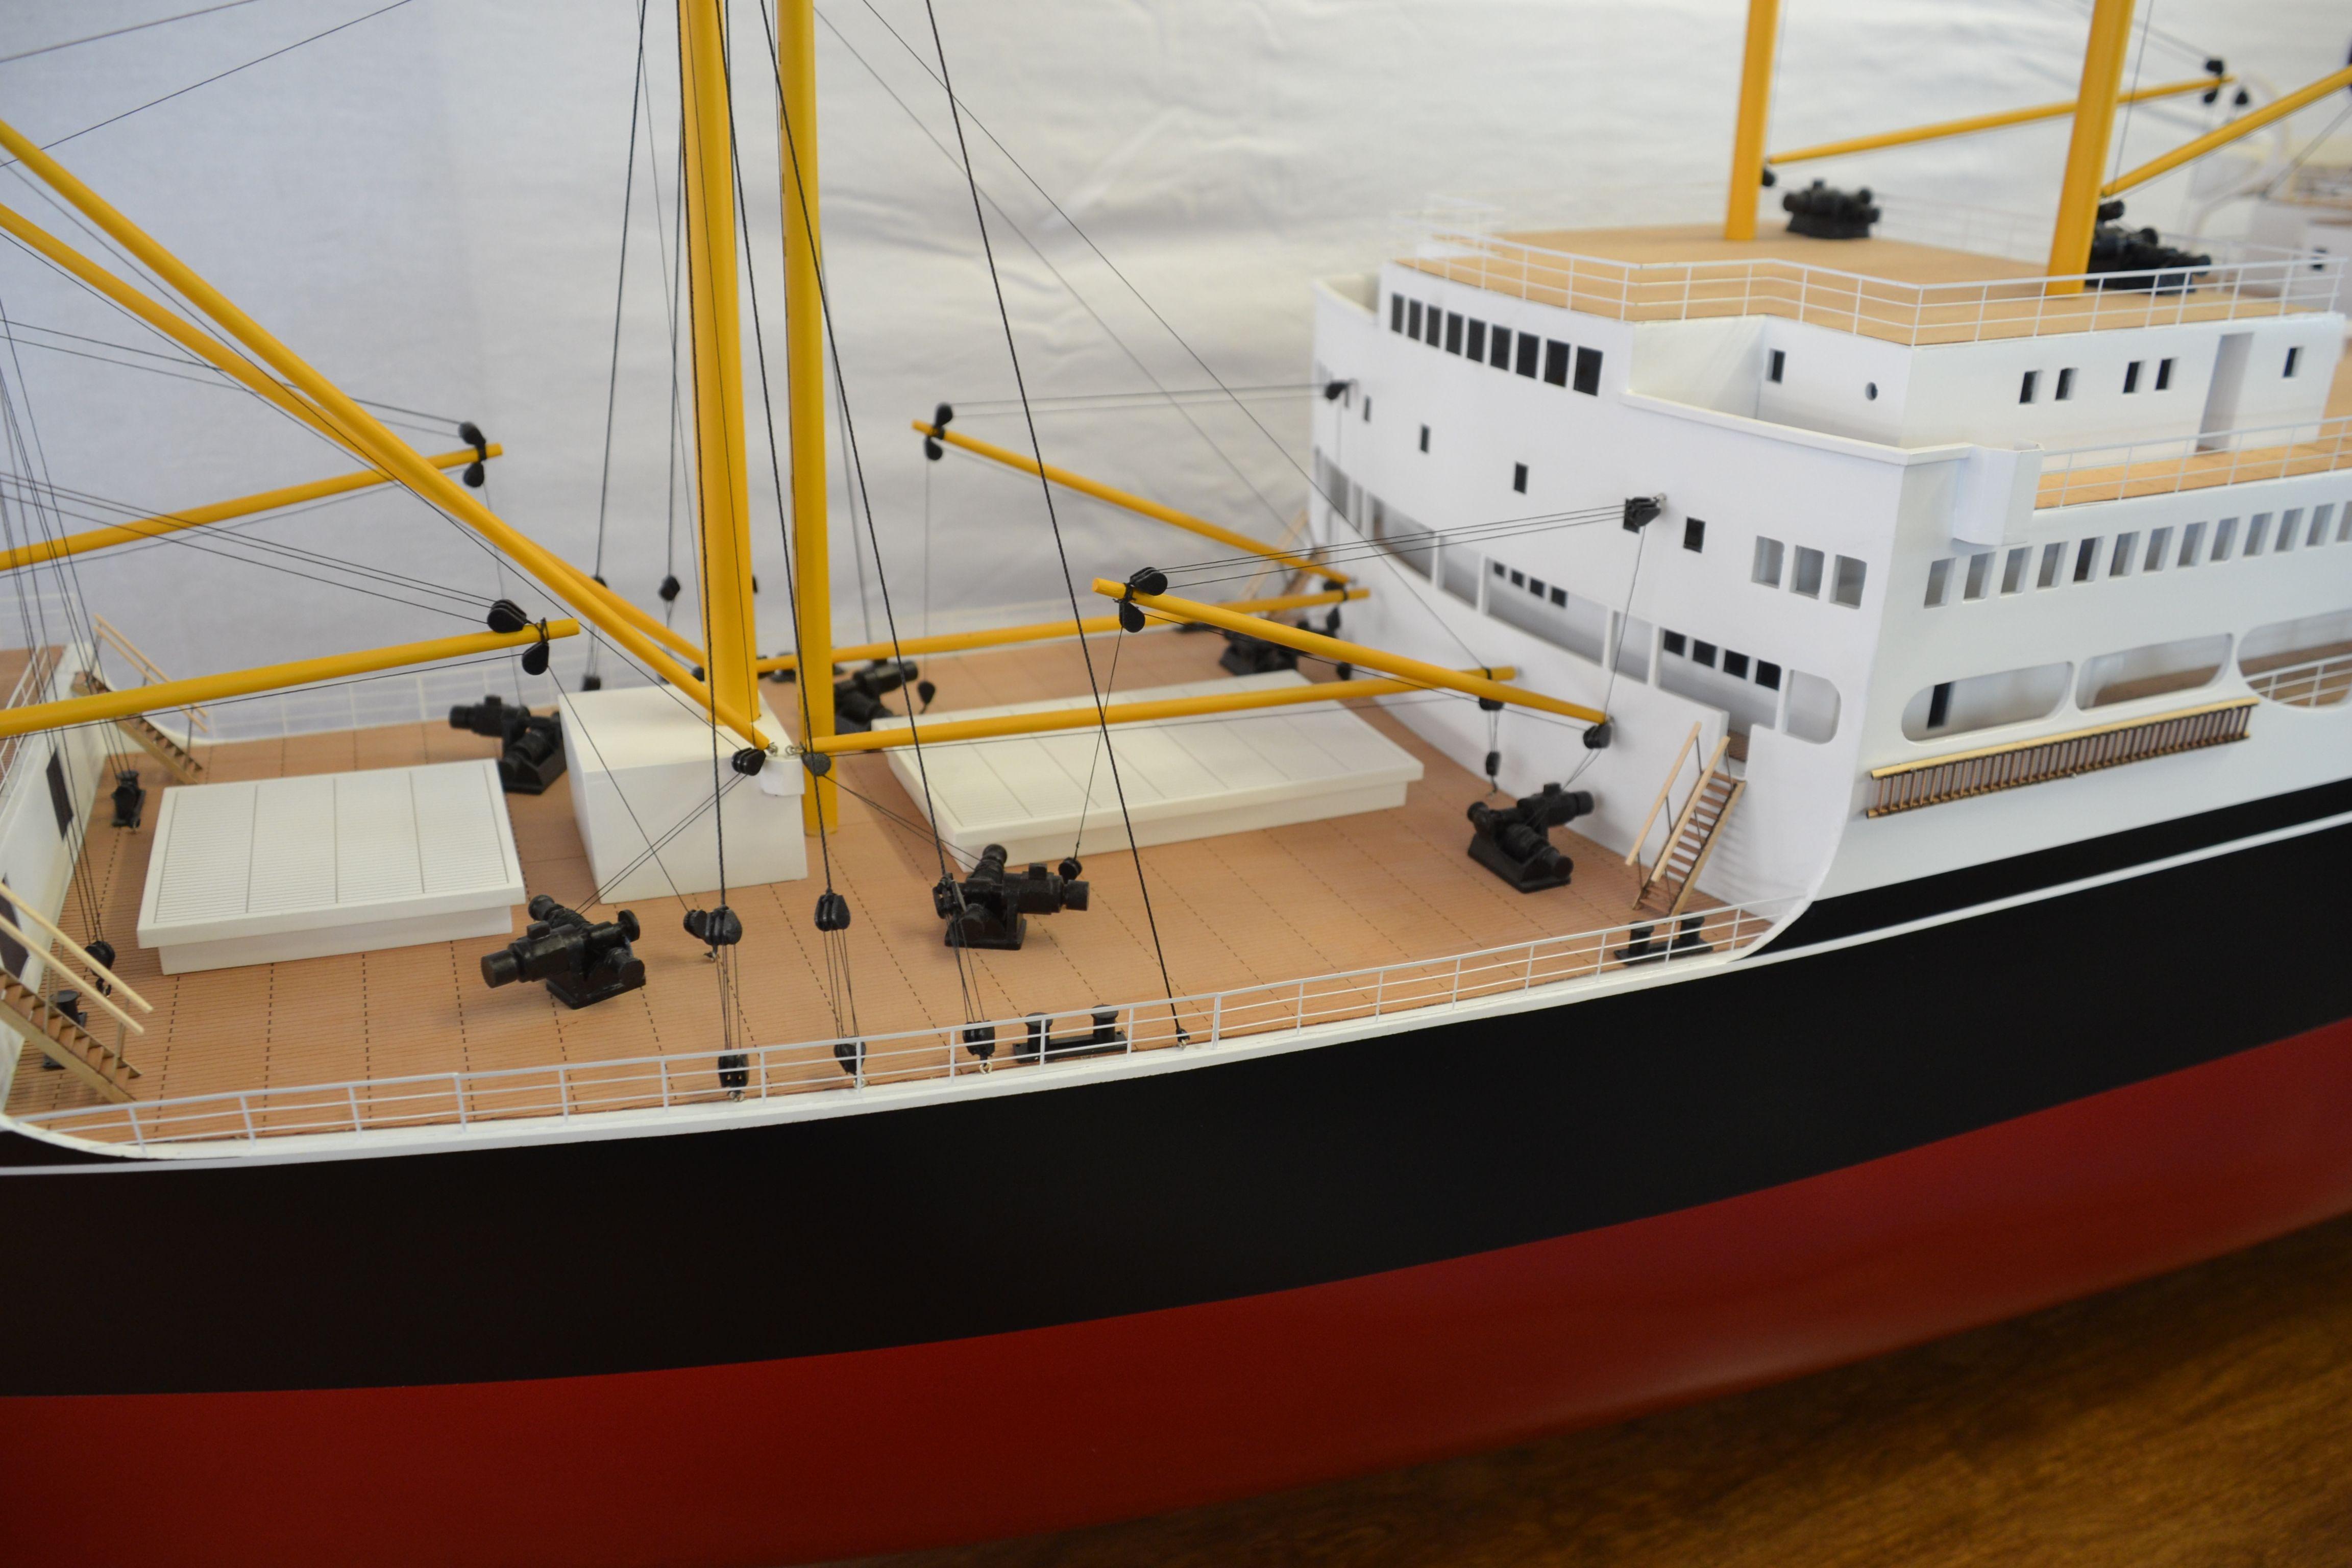 2209-12947-SS-Corinthic-Model-Ship